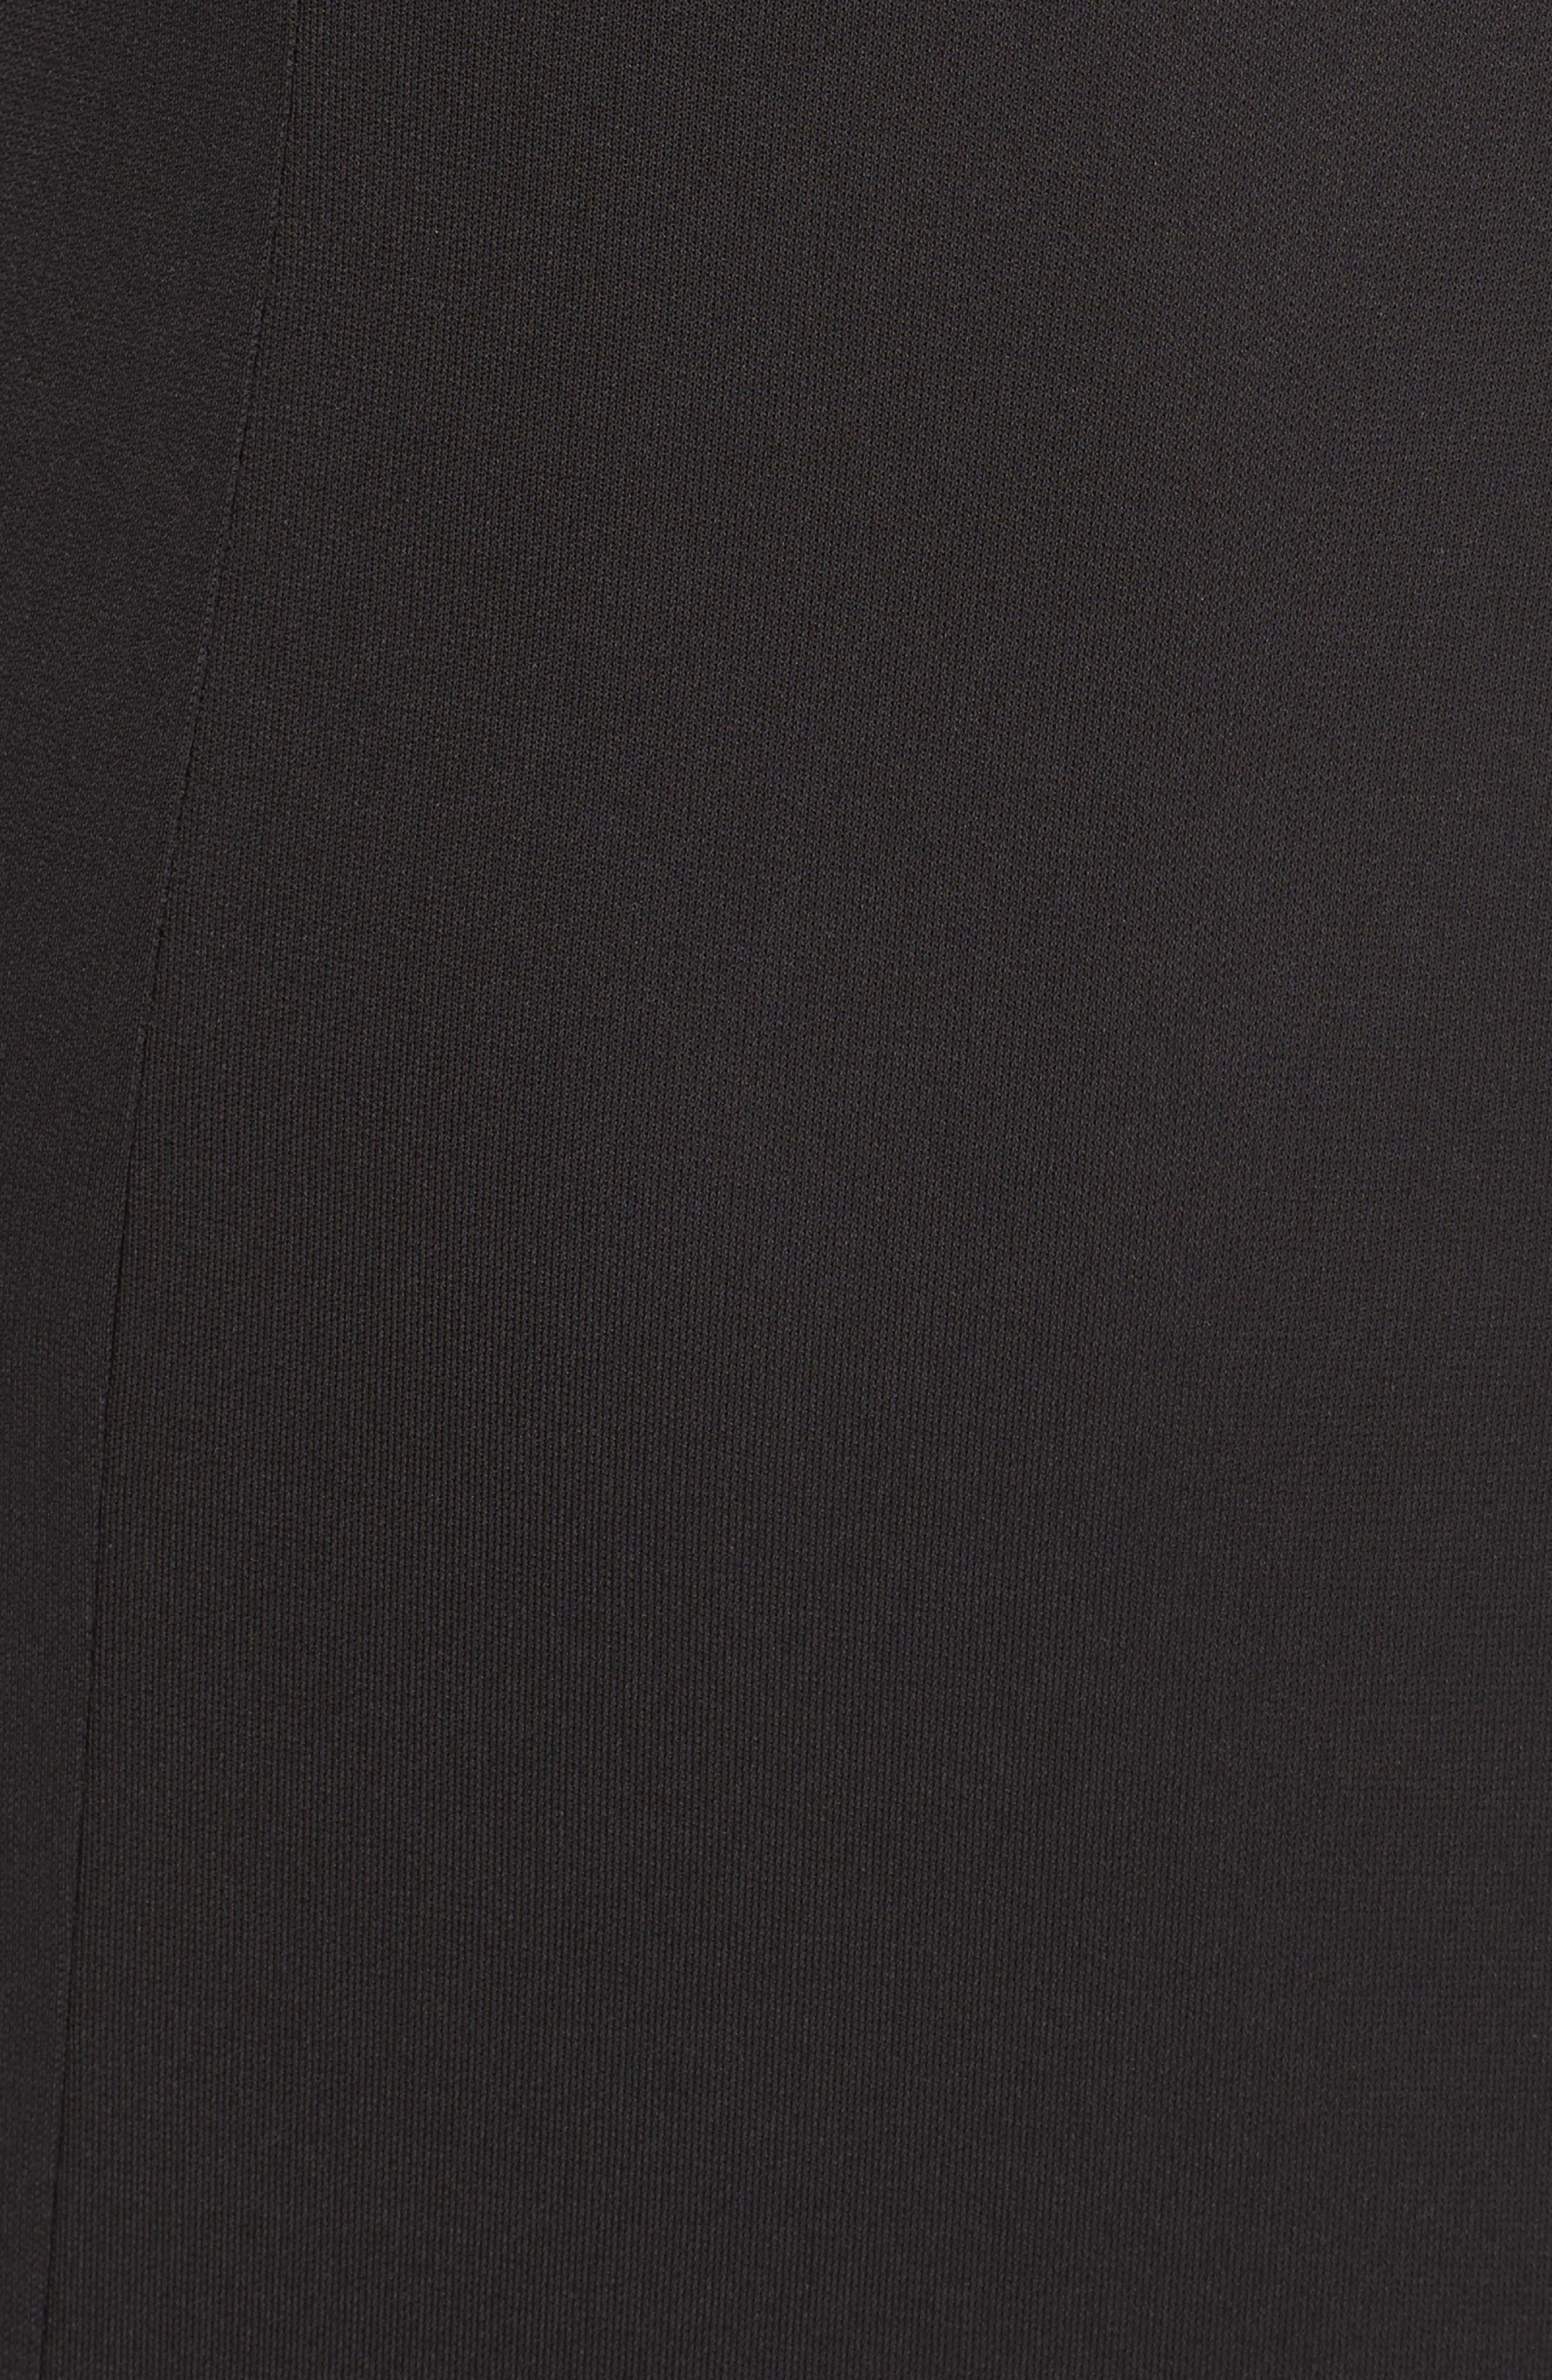 Jersey & Satin Dress,                             Alternate thumbnail 5, color,                             001